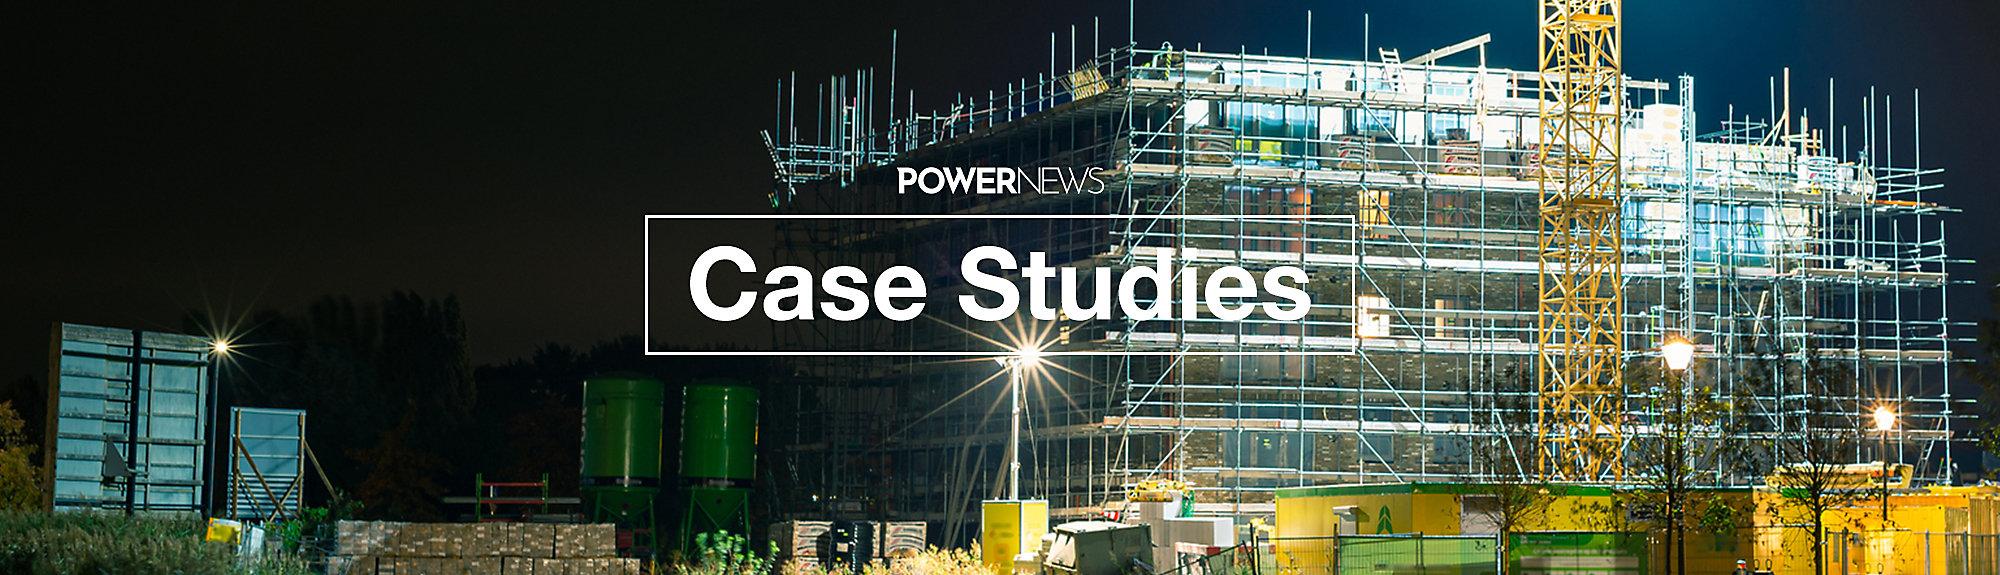 Case Studies - Powernews